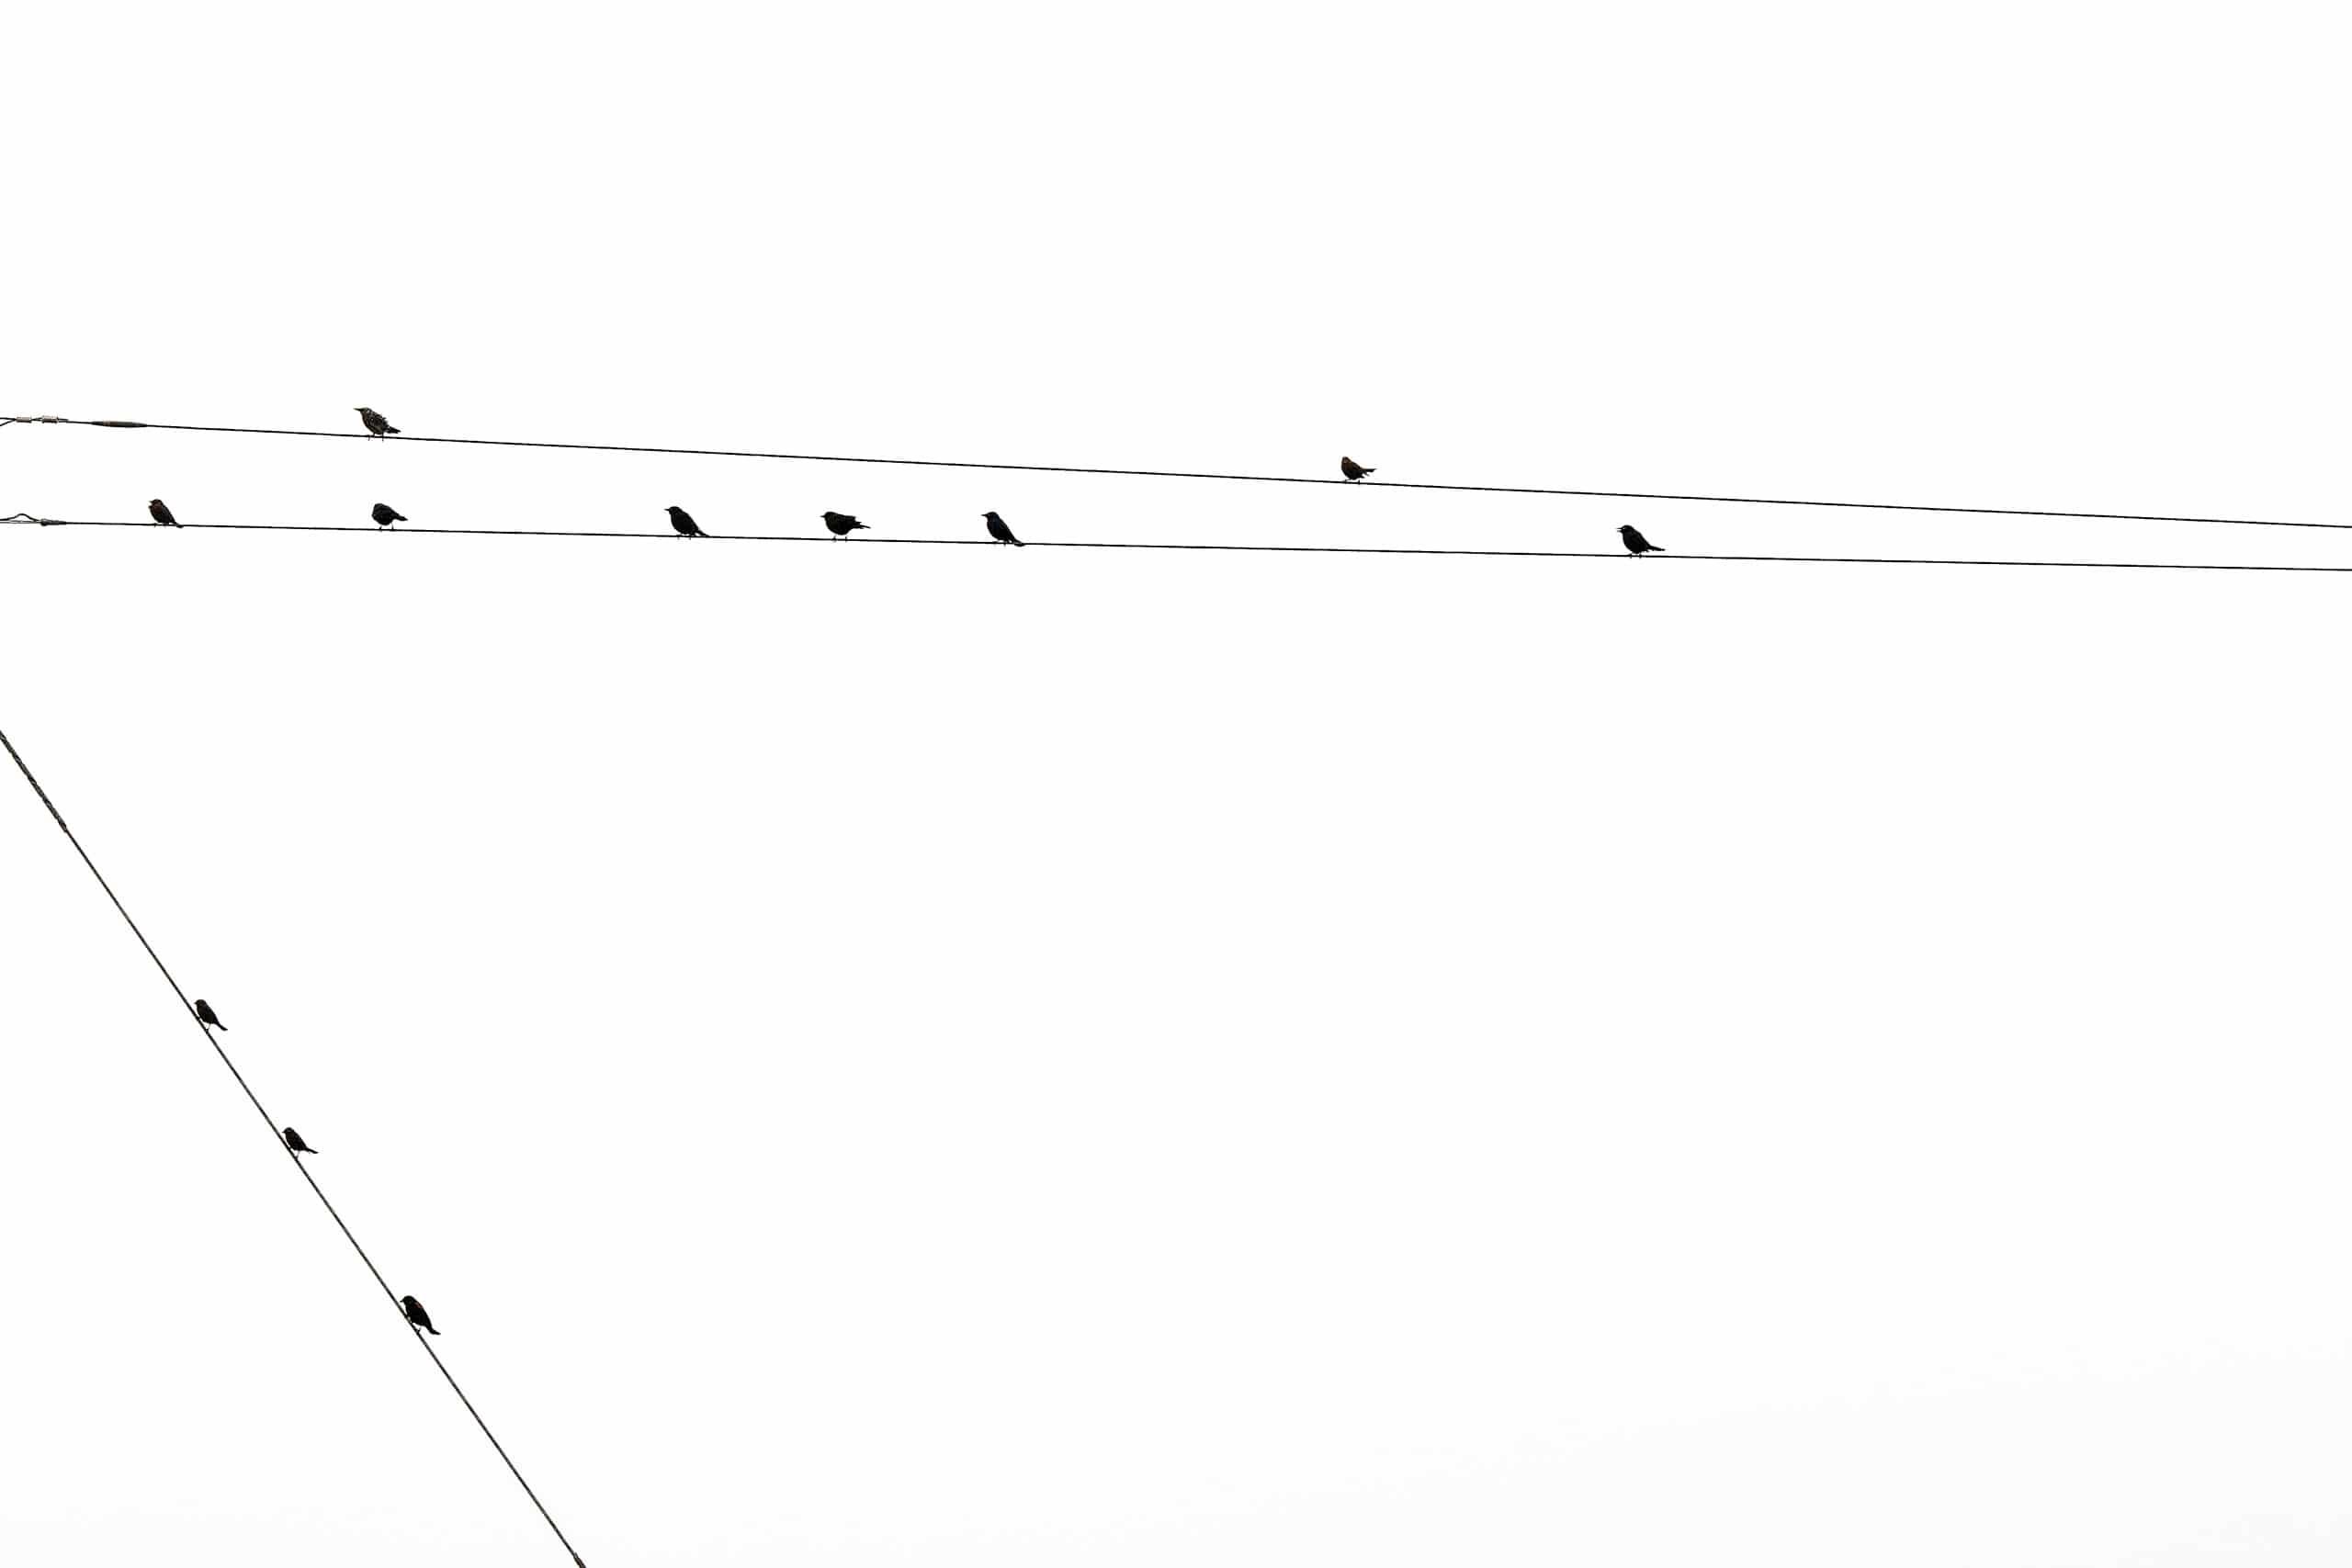 SANTA-CRUZ-WIREBIRDS-03-7779